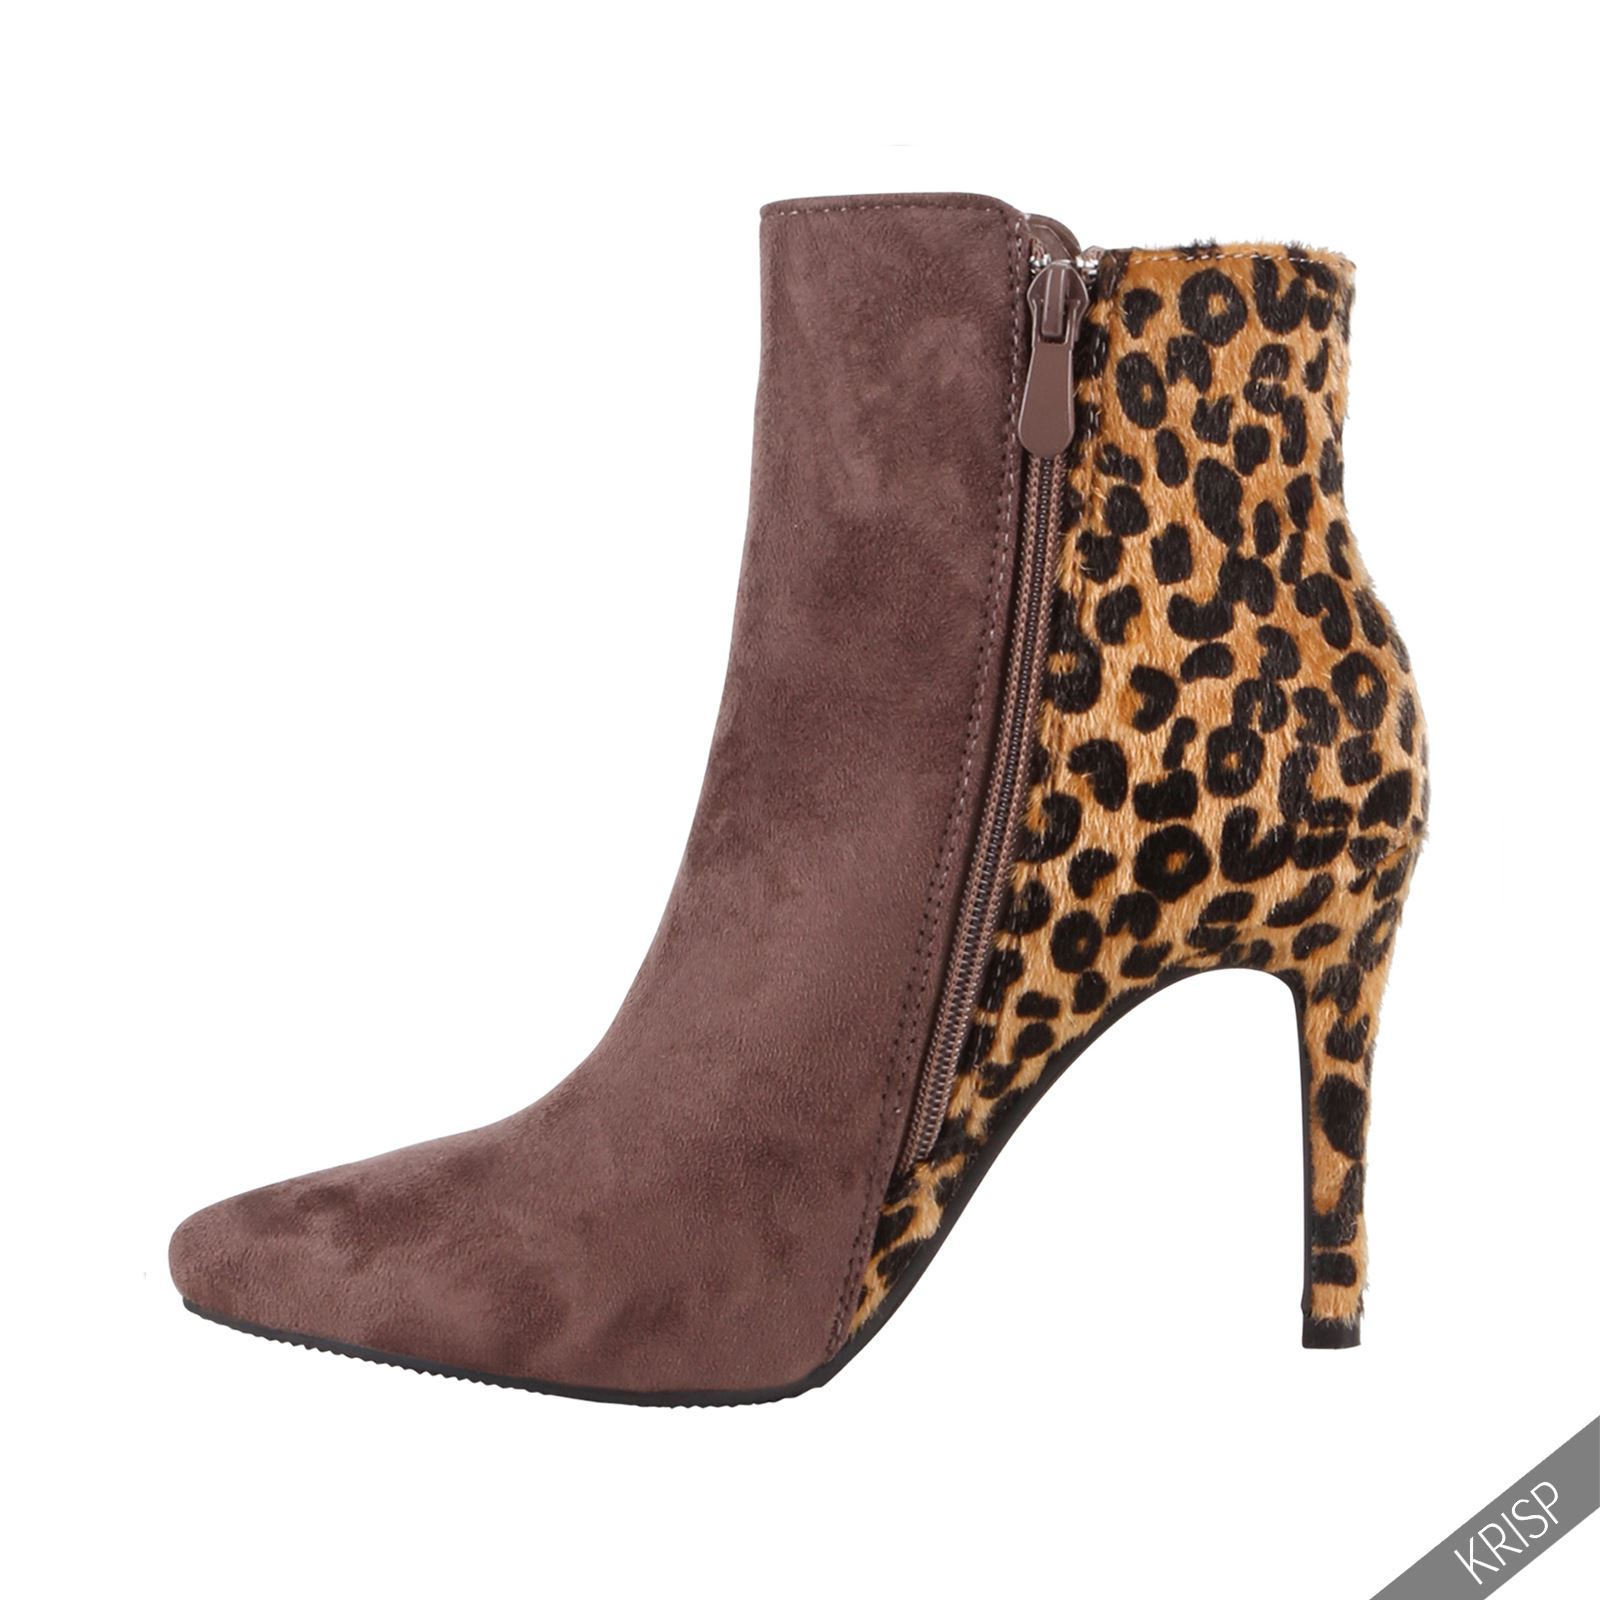 damen leoparden stiefeletten mit absatz gef ttert ankle. Black Bedroom Furniture Sets. Home Design Ideas